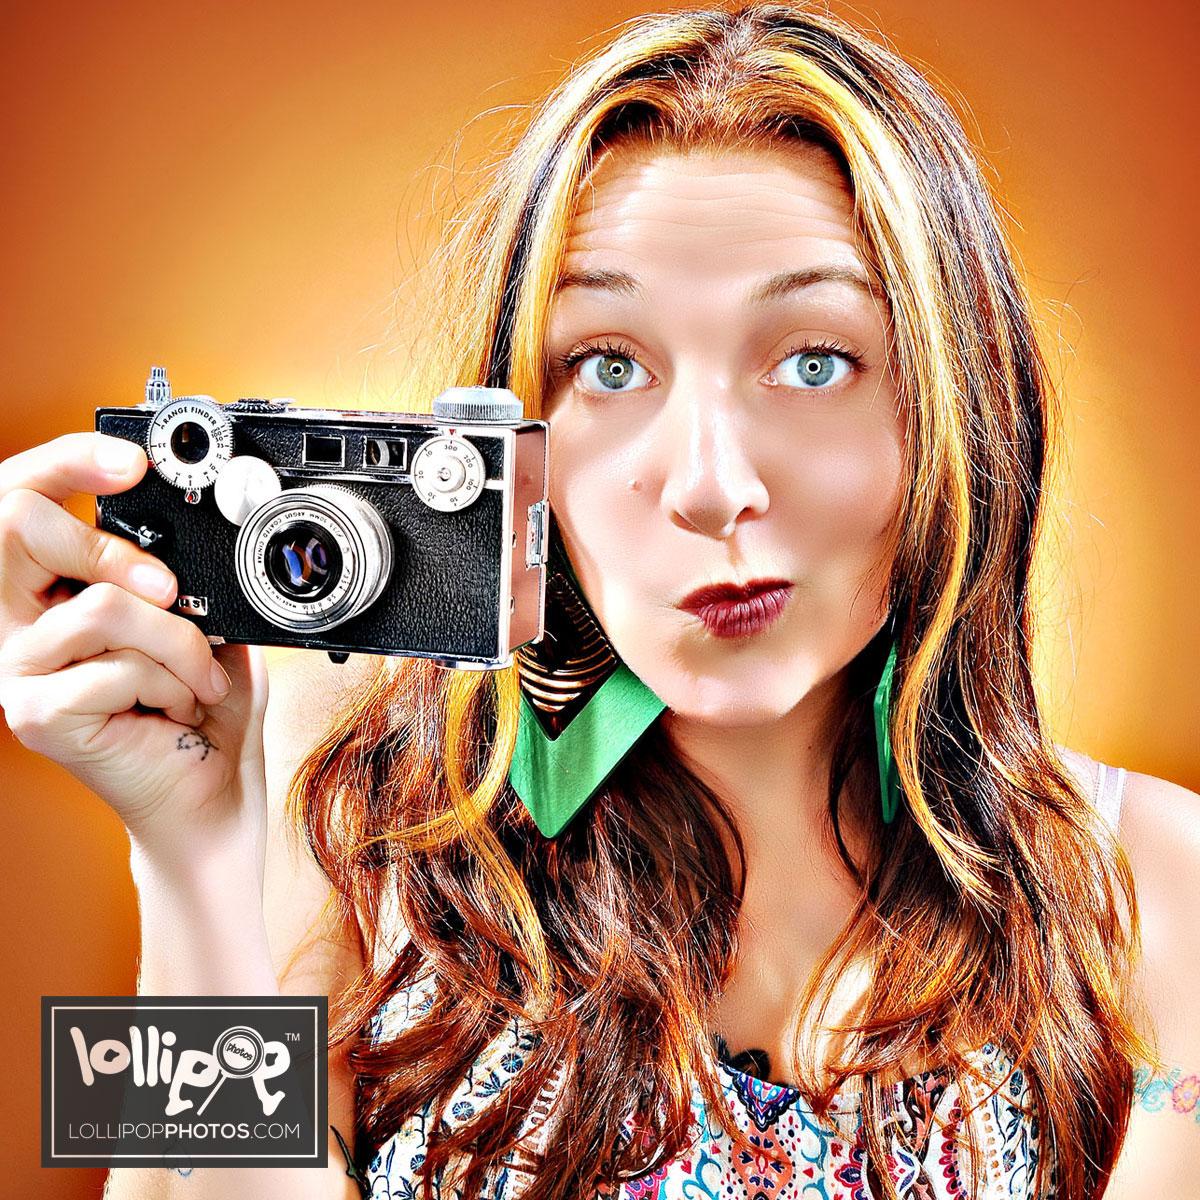 msdig-nora-canfield-lollipop-photos-569.jpg